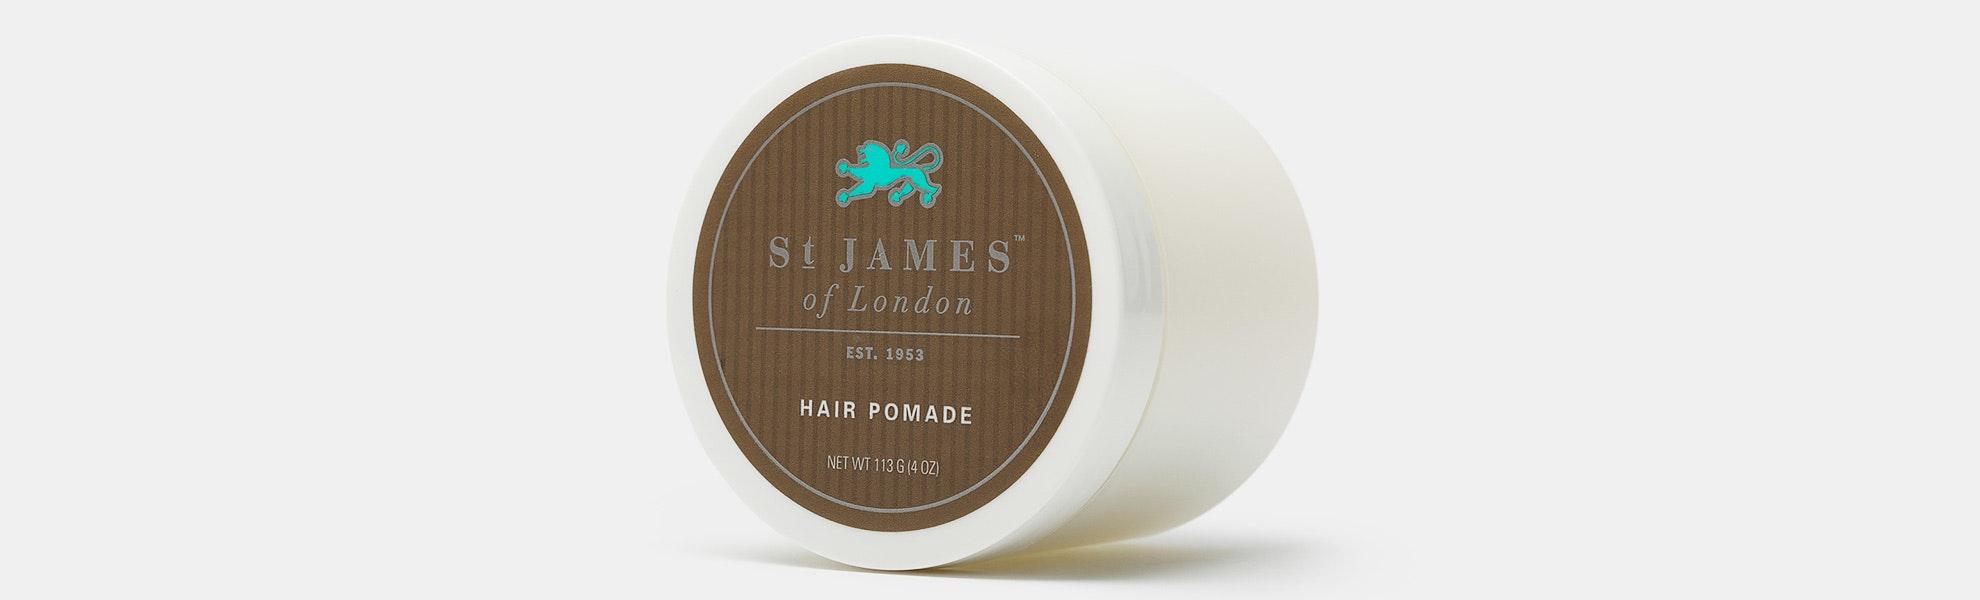 St. James of London Hair Pomade